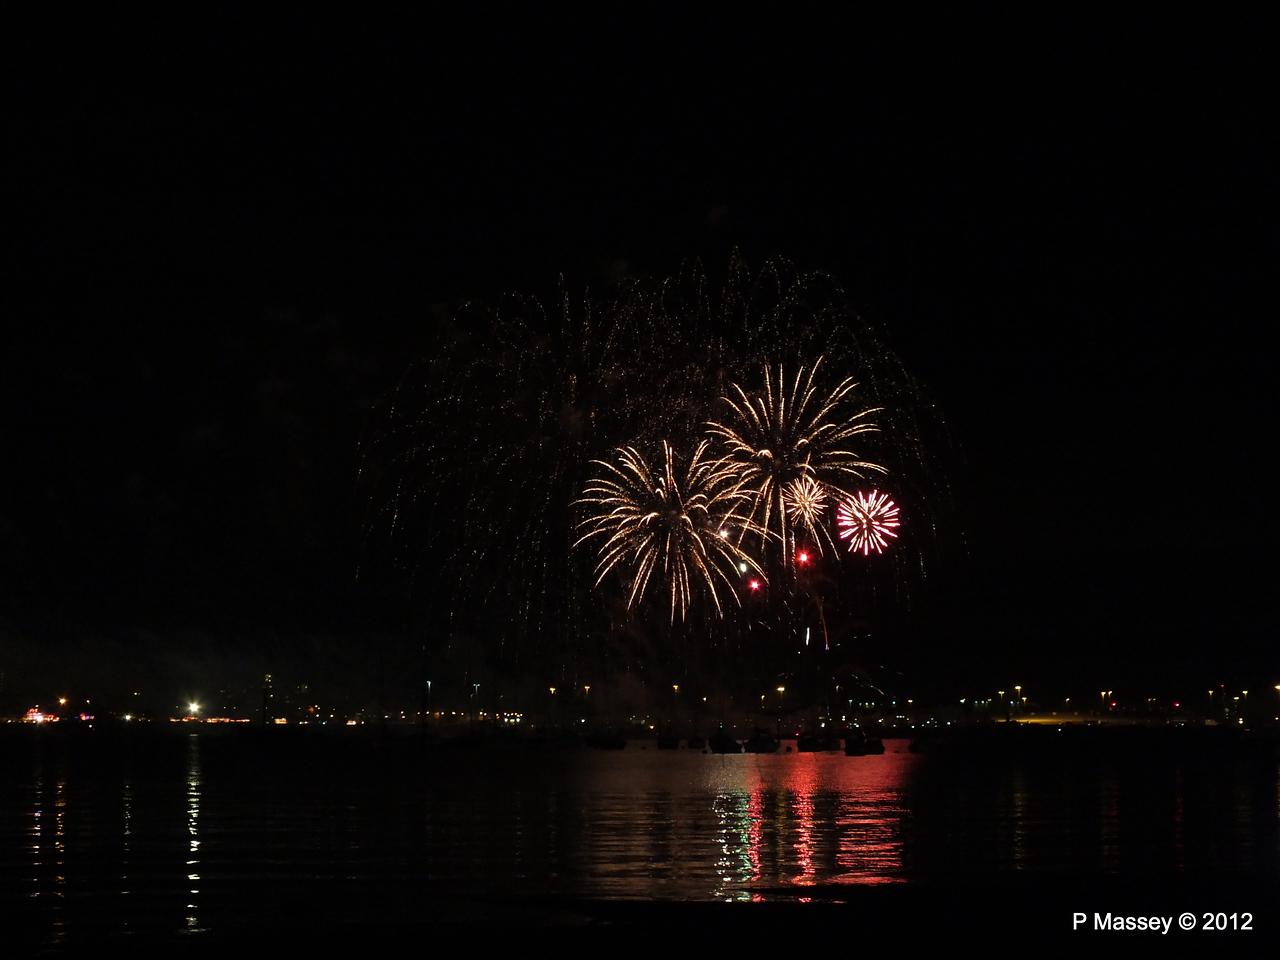 Fireworks off Mayflower Park PDM 03-11-2012 20-55-31